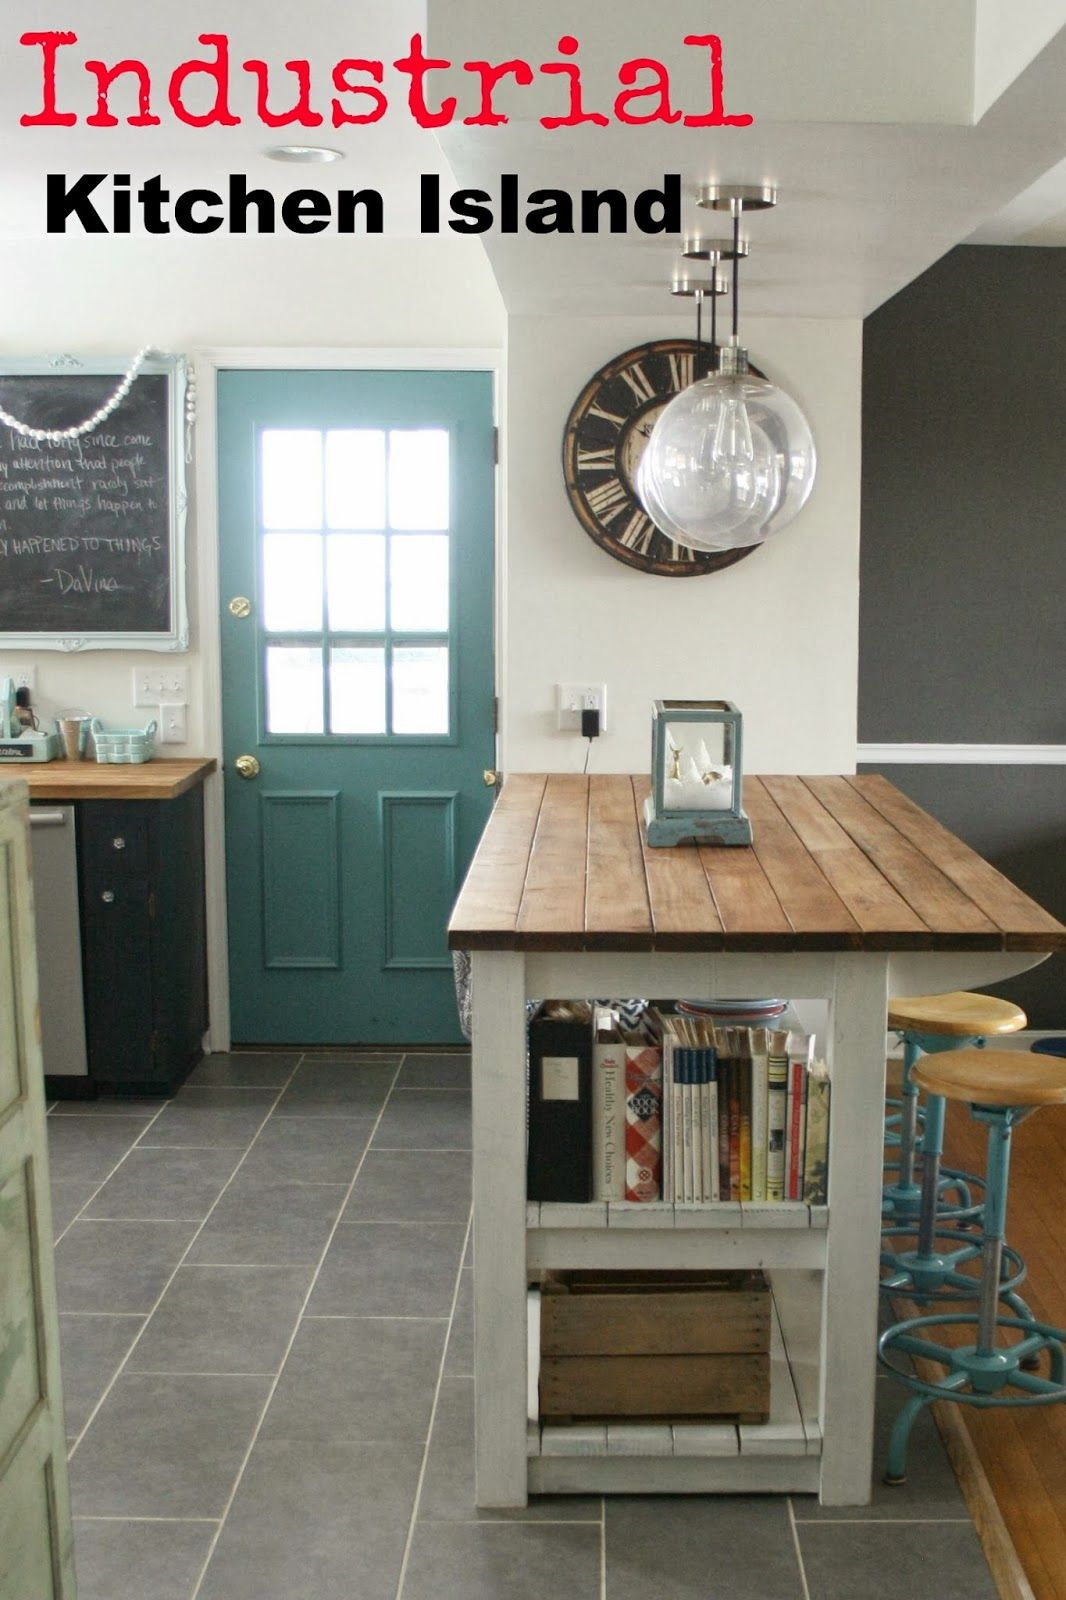 Küchendesign diy primitive u proper my industrial look kitchen island and that time